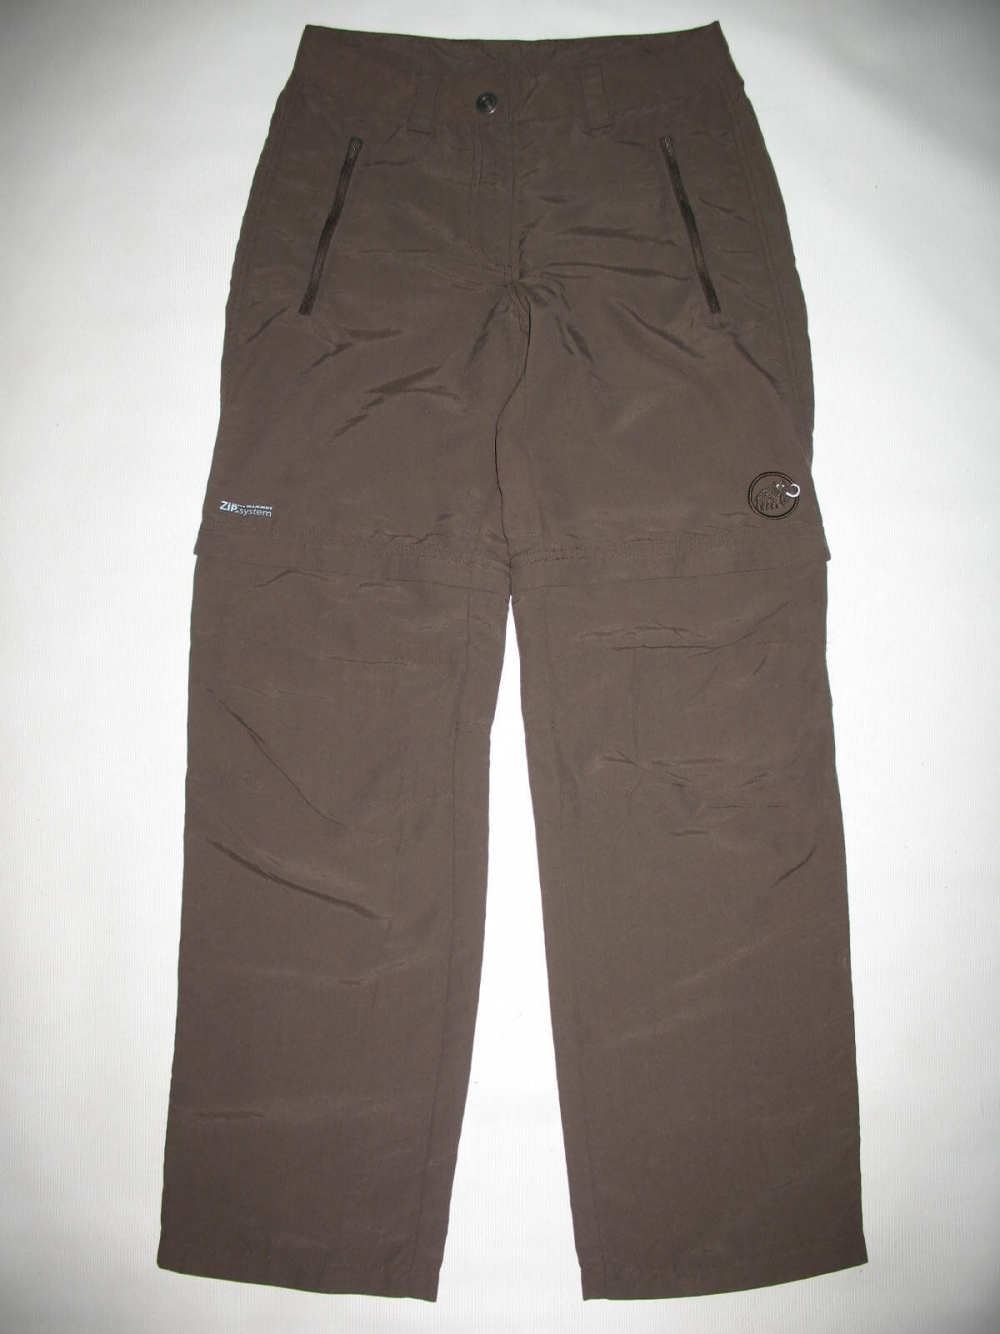 Штаны MAMMUT Zip Off brown pants lady (размер S/XS) - 1